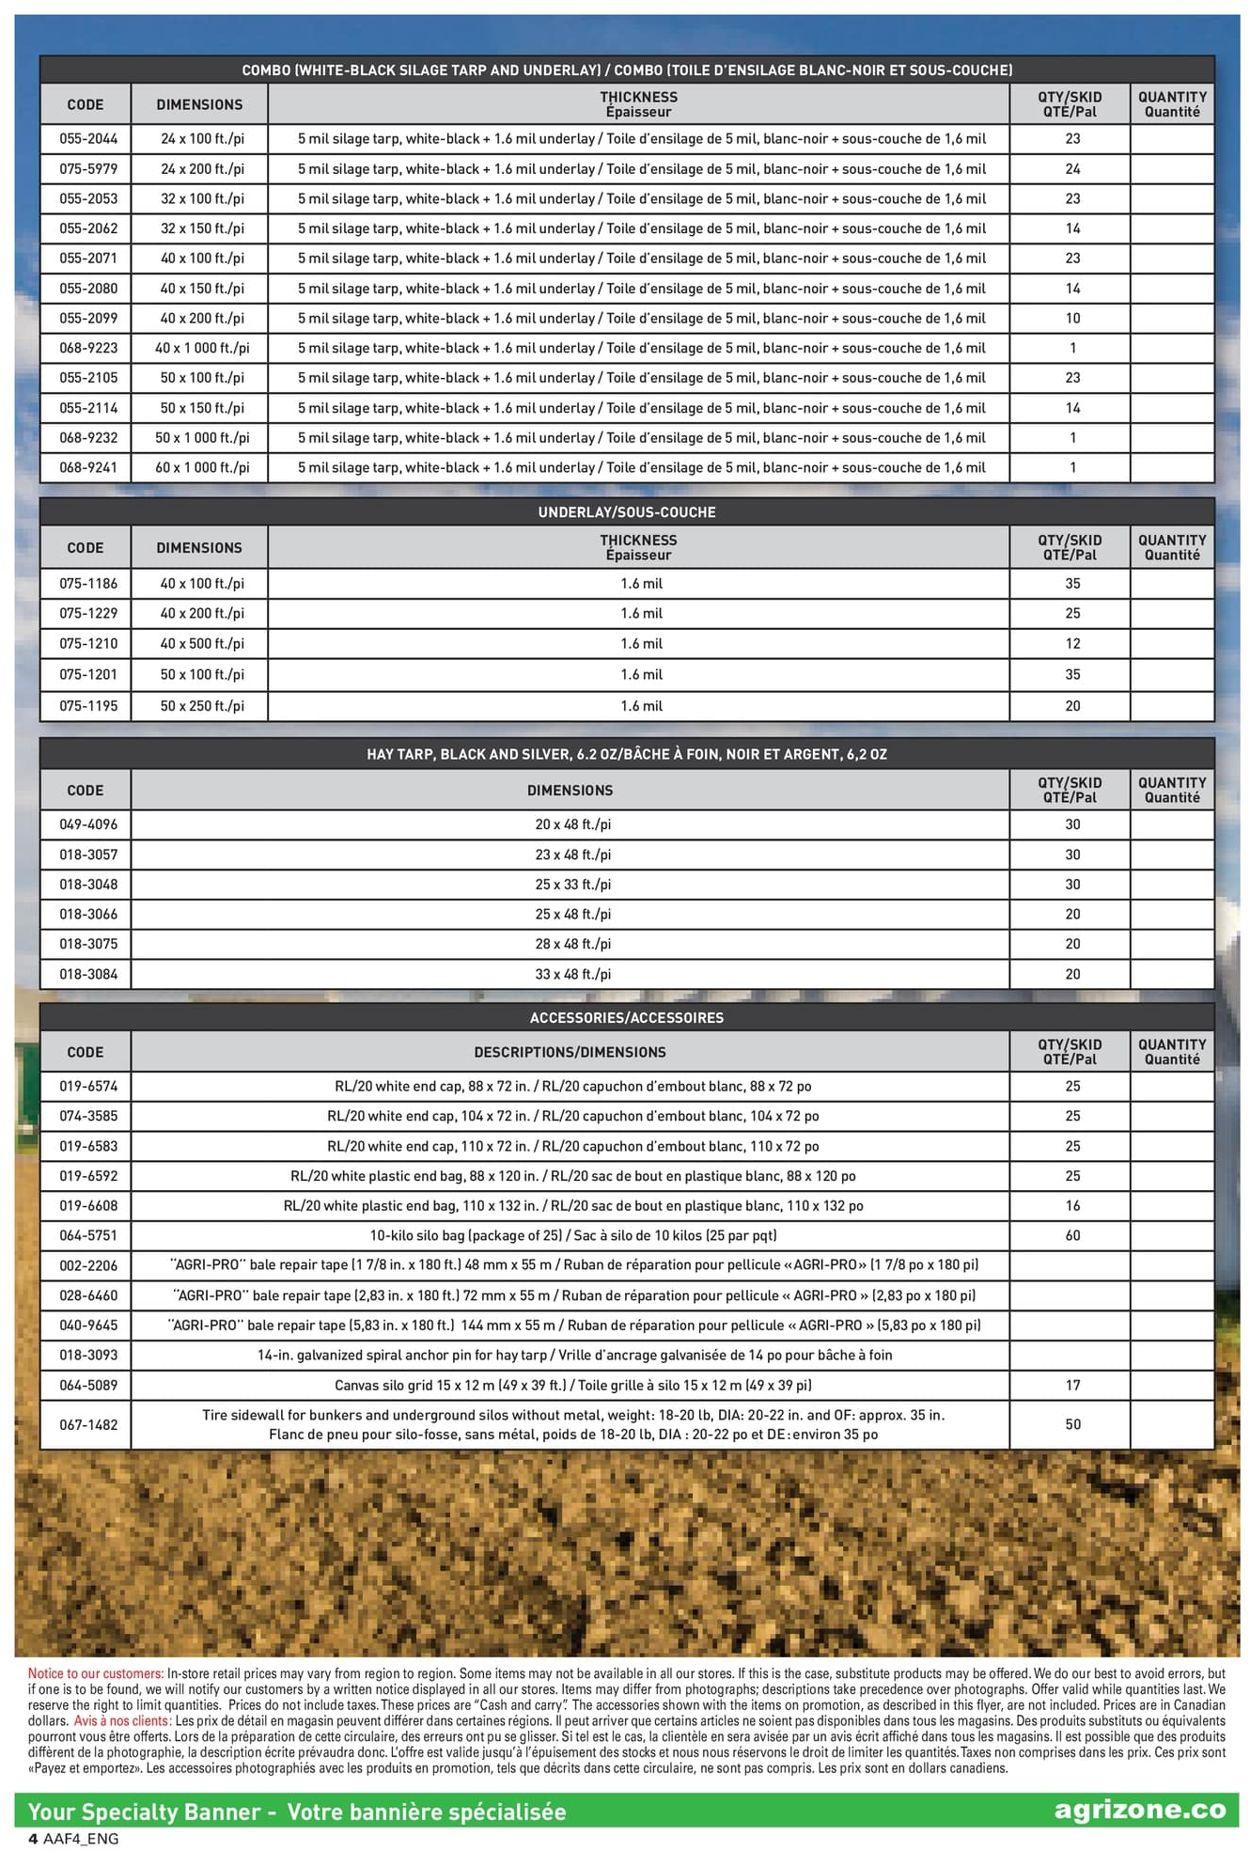 BMR - Haying Season 2021 Flyer - 01/21-12/31/2021 (Page 4)